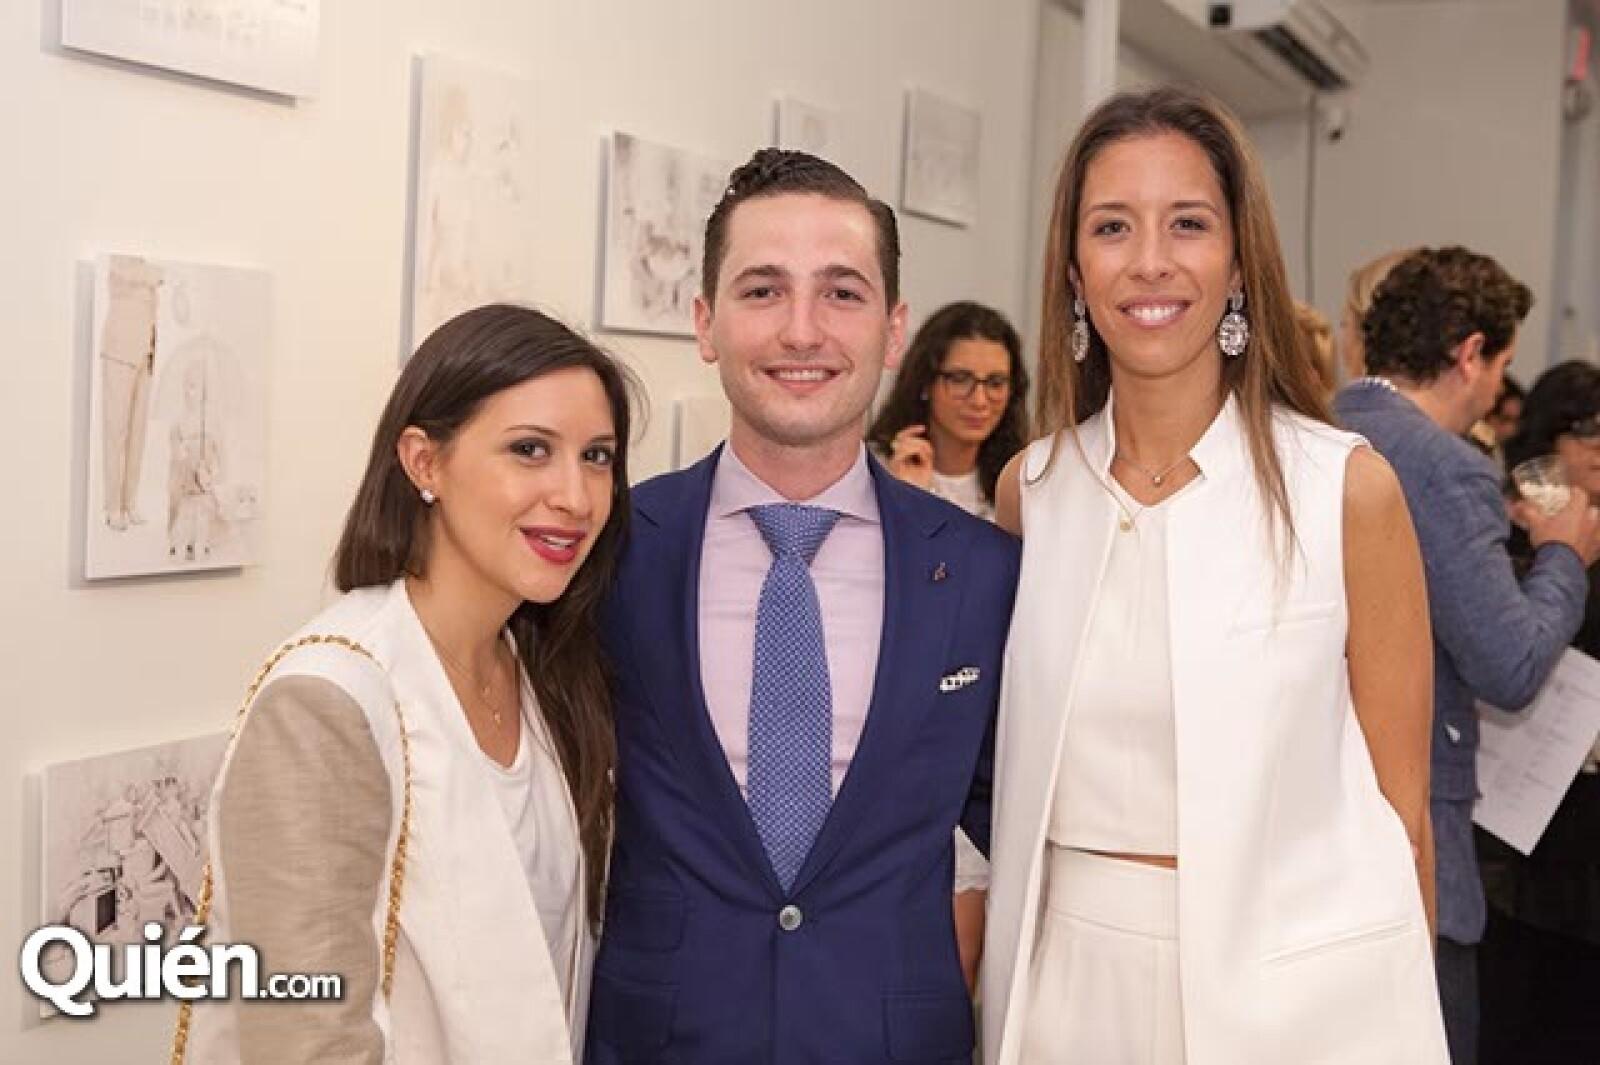 Ana Cecilia Pérez,Alexis Zambrano y Juana Domenzain Girault